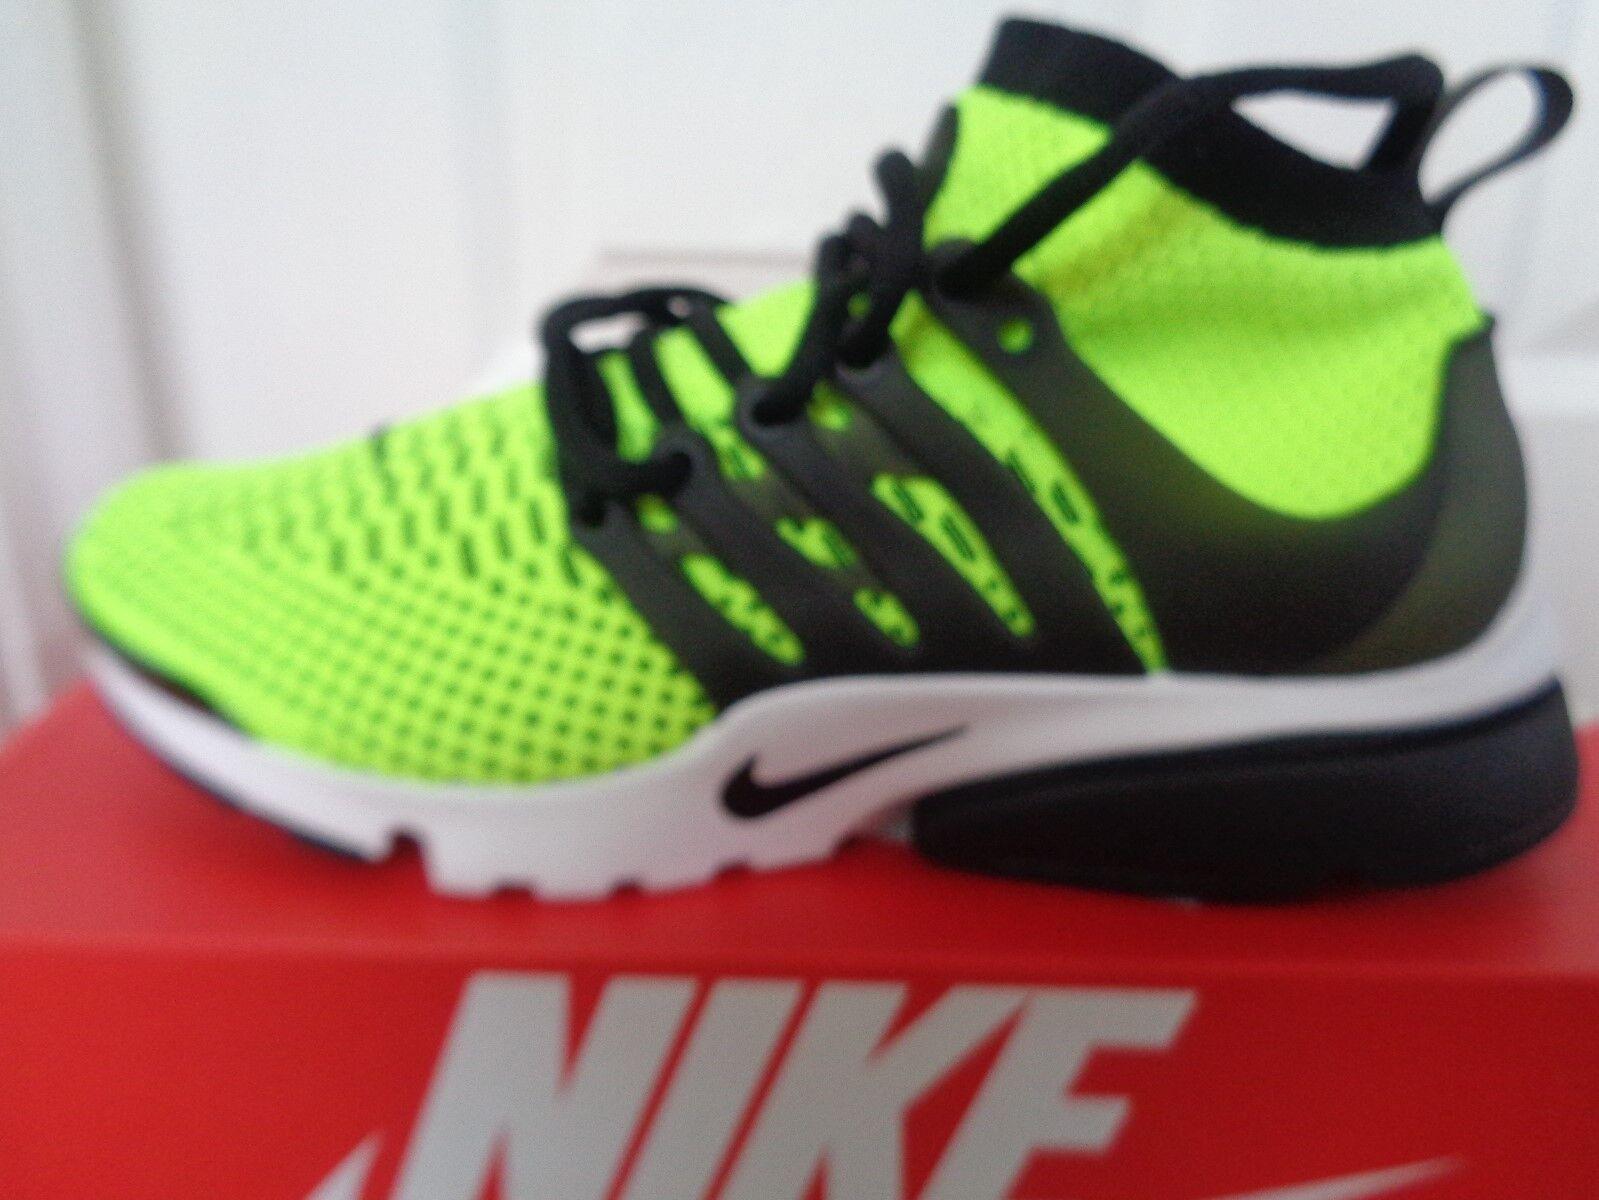 Nike trainers Air Presto flyknit ultra trainers Nike shoes 835570 701 eu 40 us 7 NEW+BOX e08b07